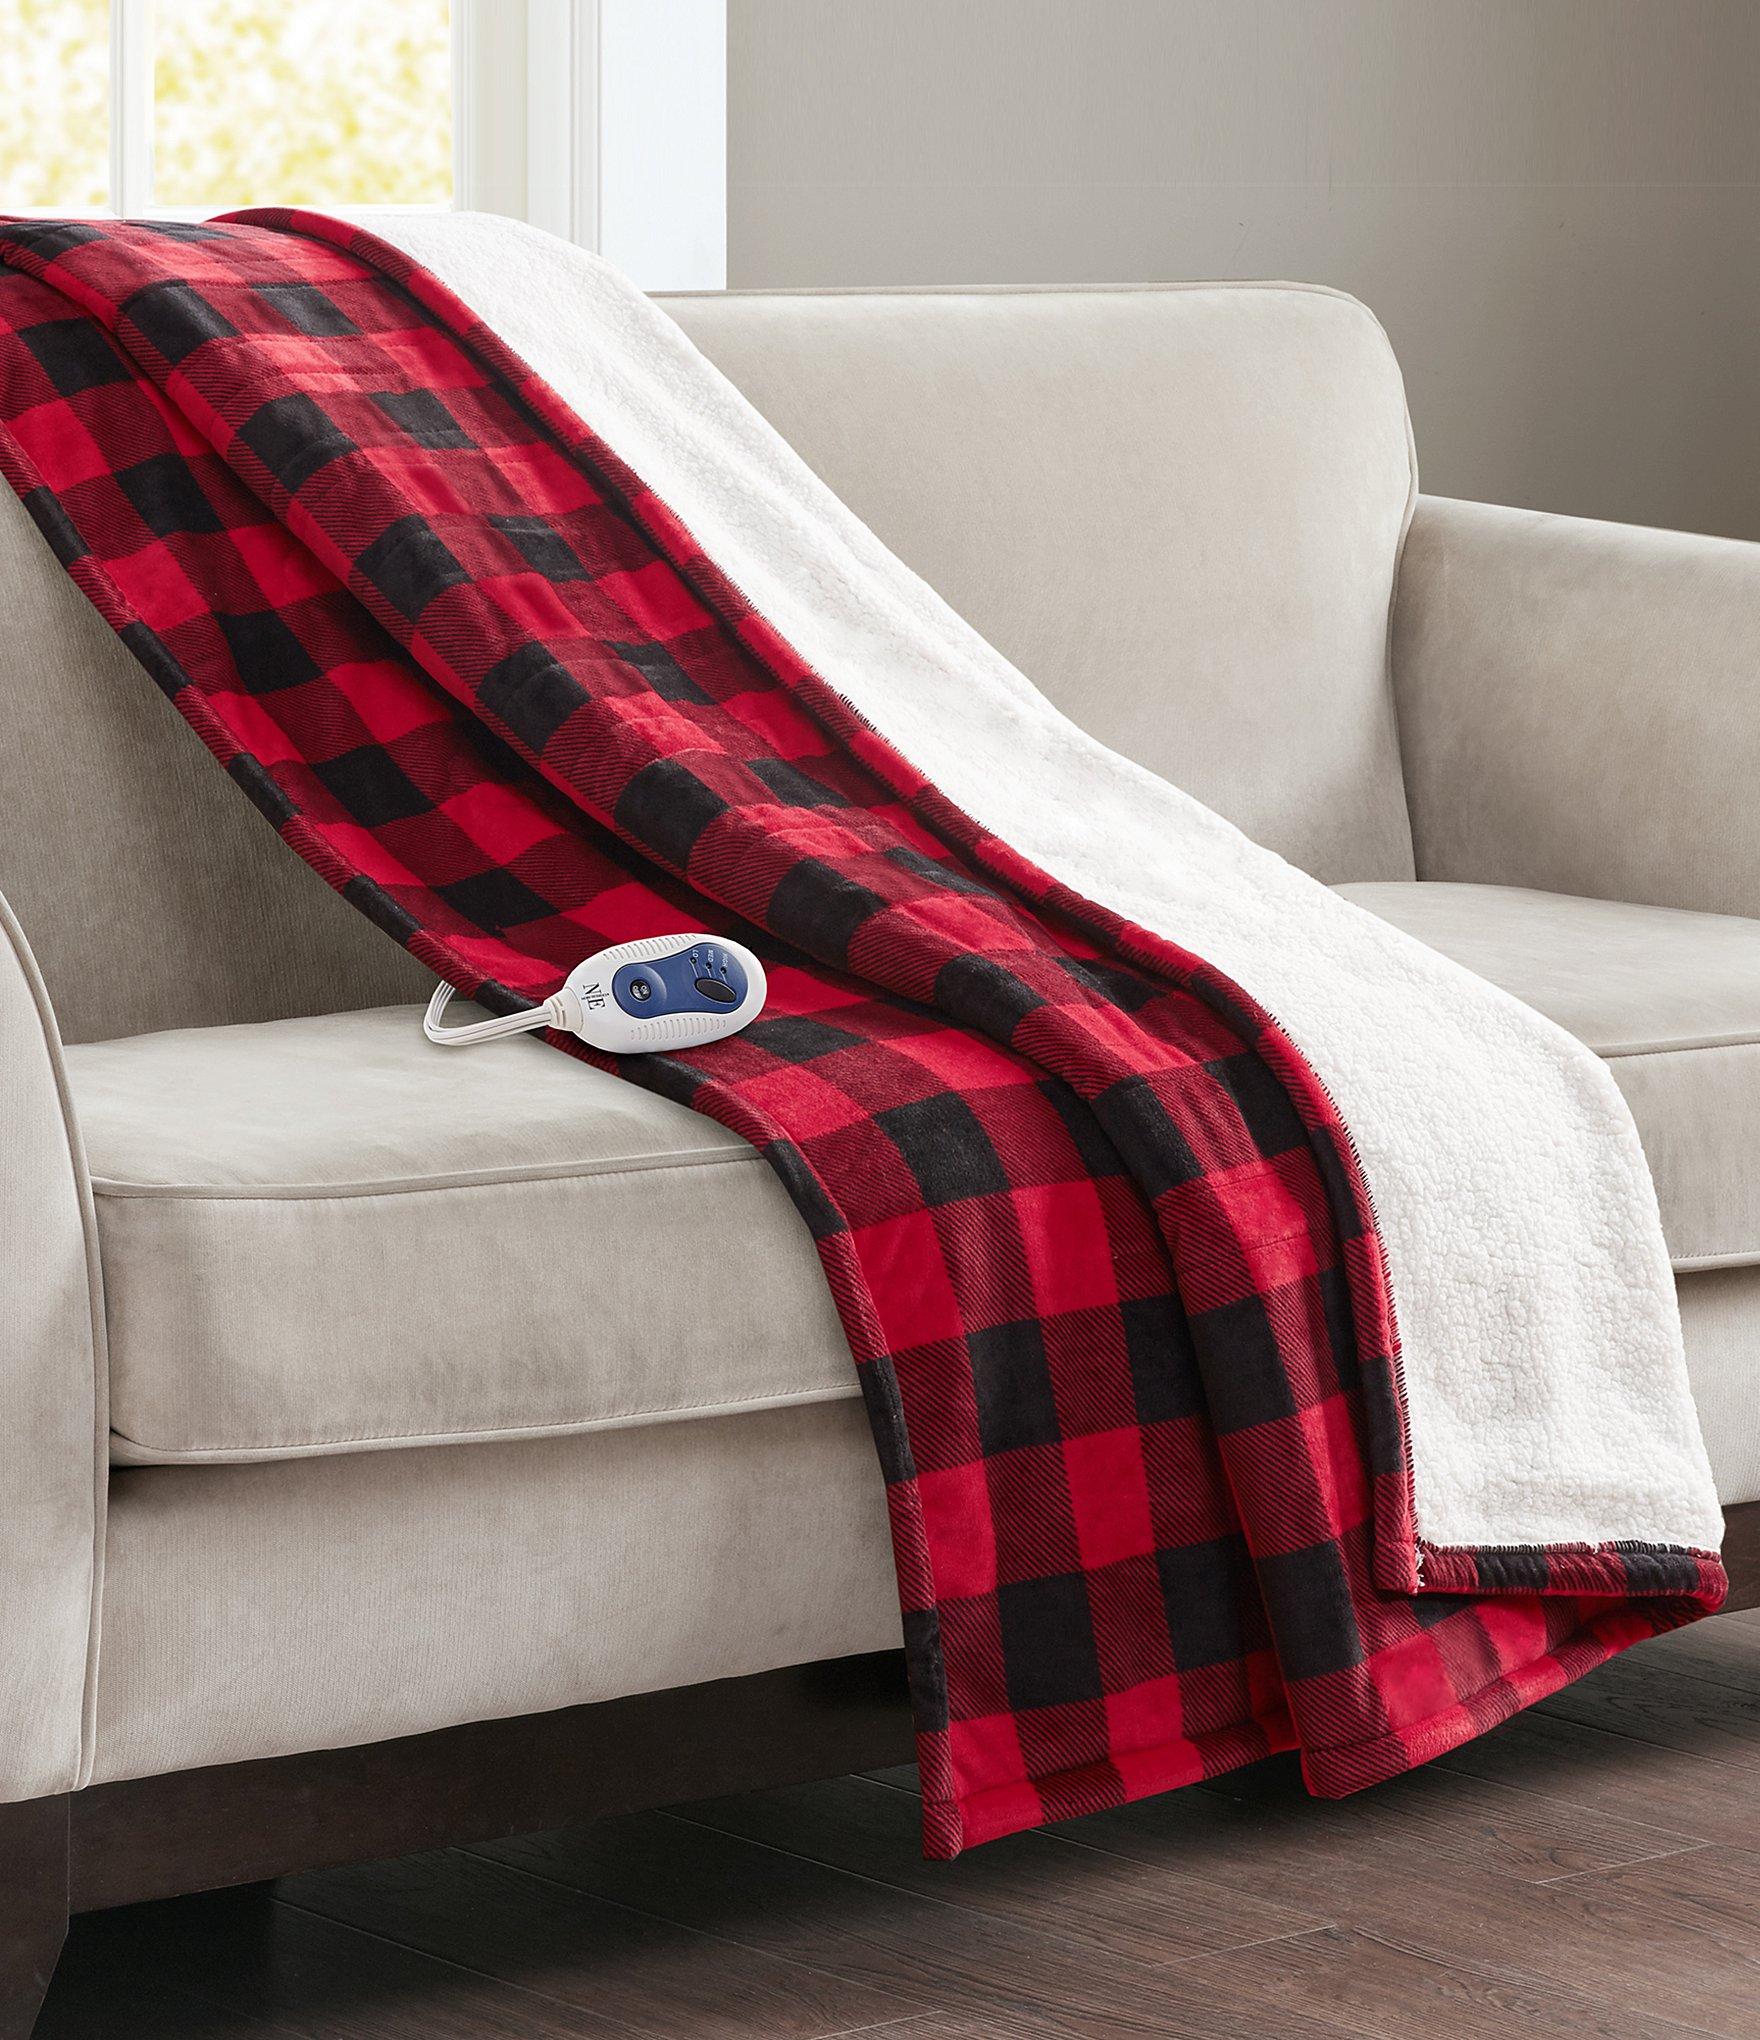 Blankets & Decorative Throws